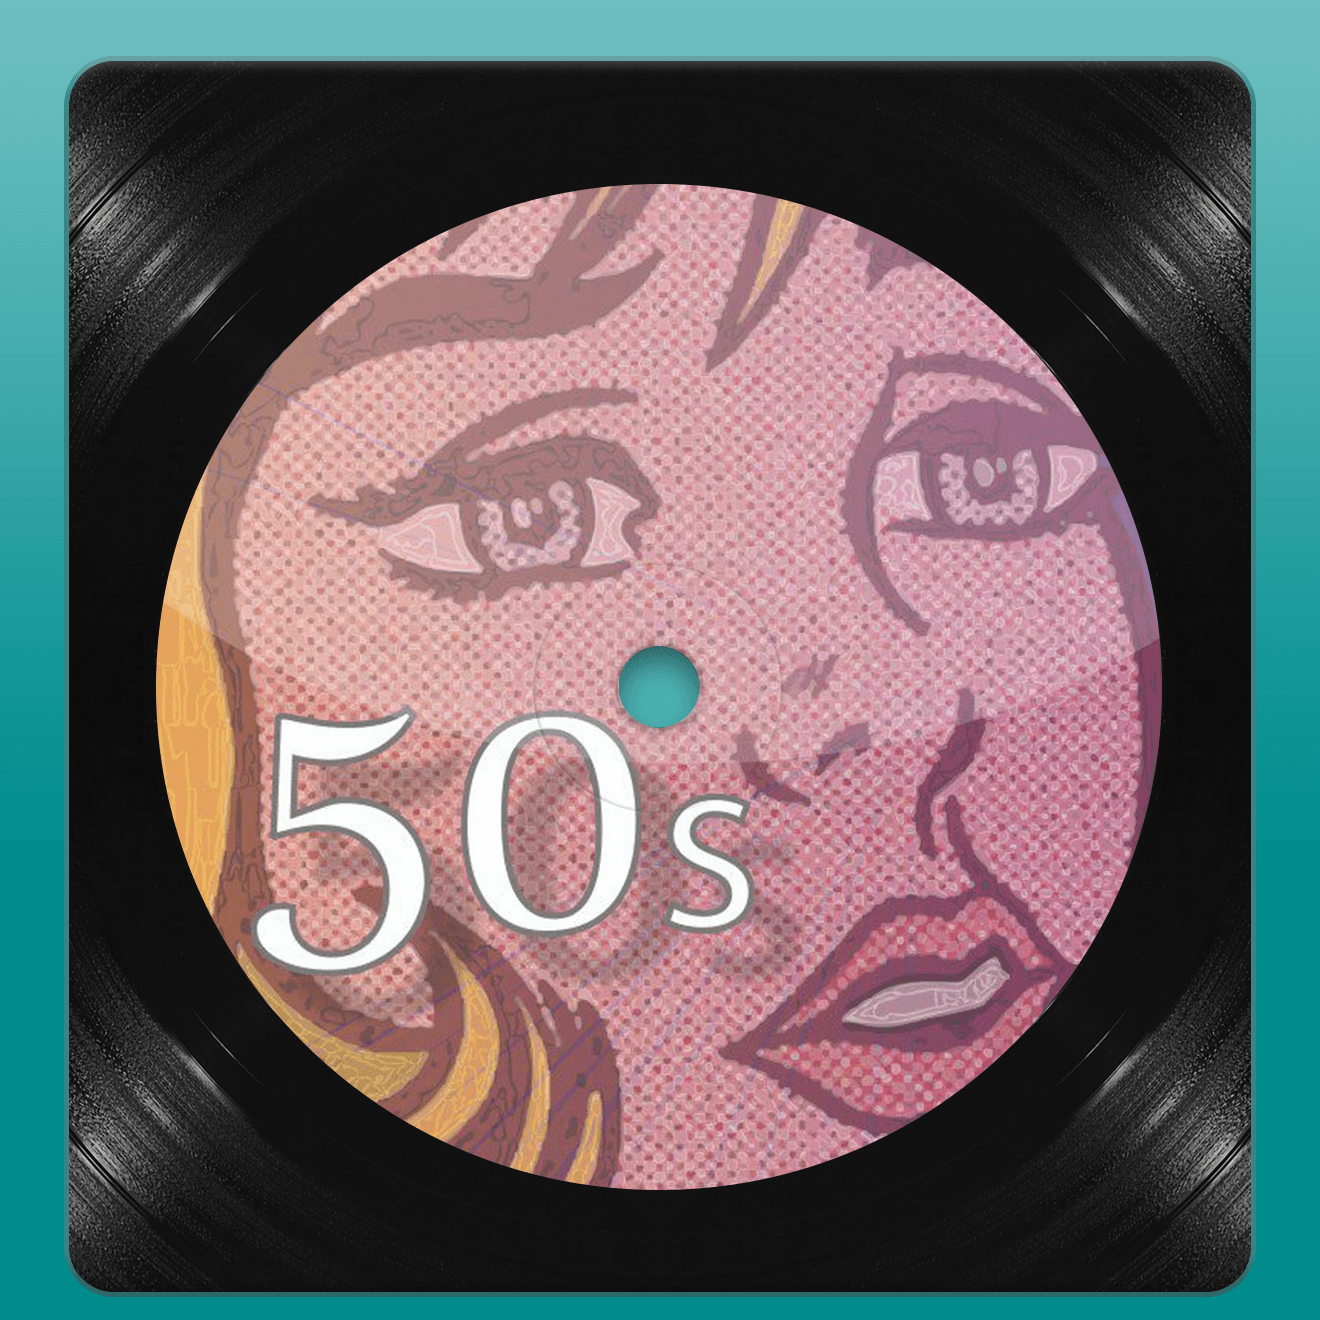 Rewind 50s